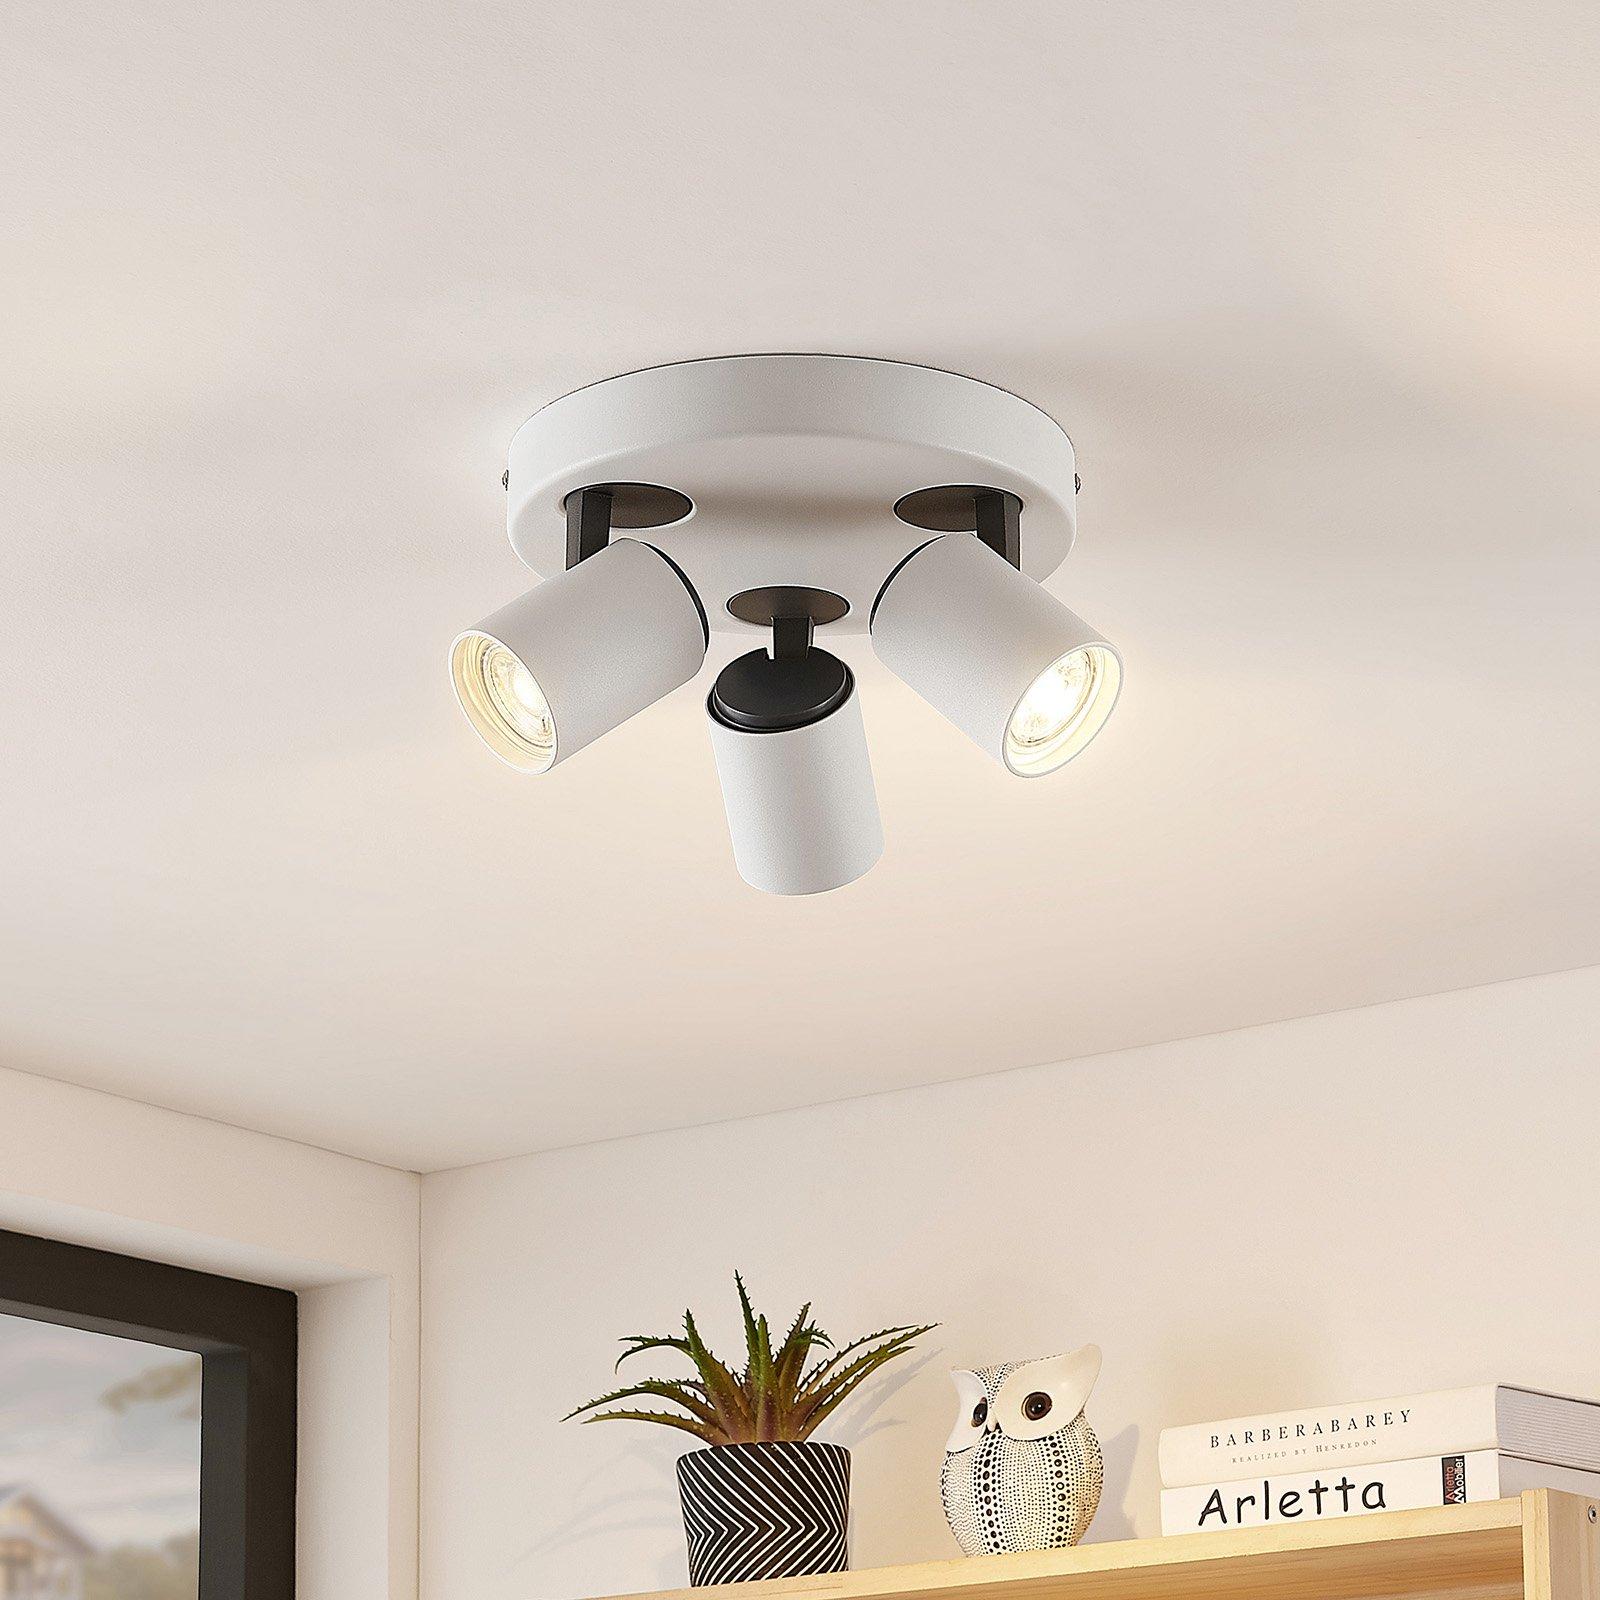 Lindby Ninette taklampe, hvit, 3 lyskilder, rund